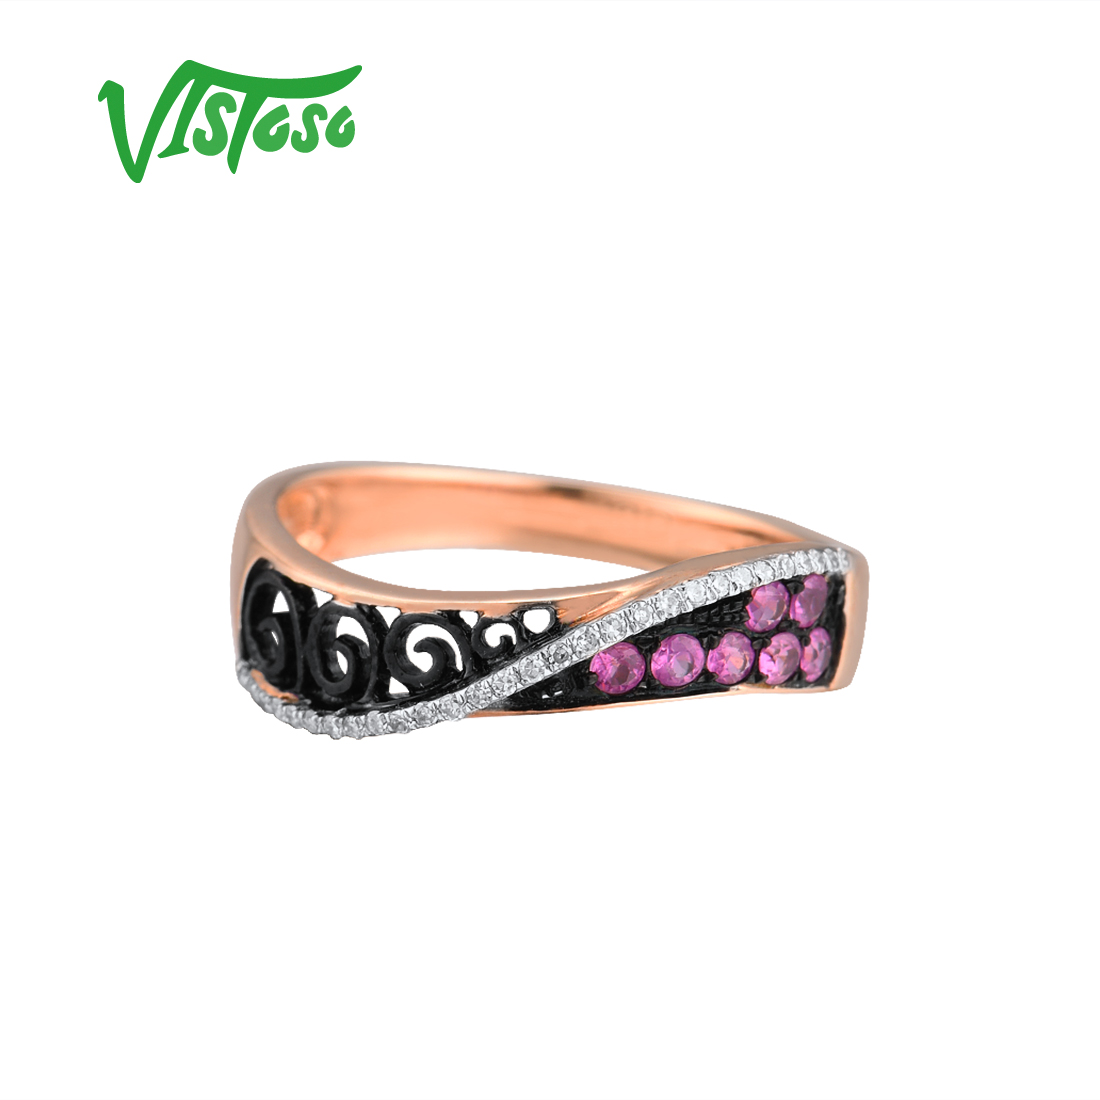 Vistoso 여성을위한 골드 링 정품 14 k 585 로즈 골드 링 스파클링 다이아몬드 핑크 사파이어 할로우 라임 라인 트렌디 파인 쥬얼리-에서반지부터 쥬얼리 및 액세서리 의  그룹 2